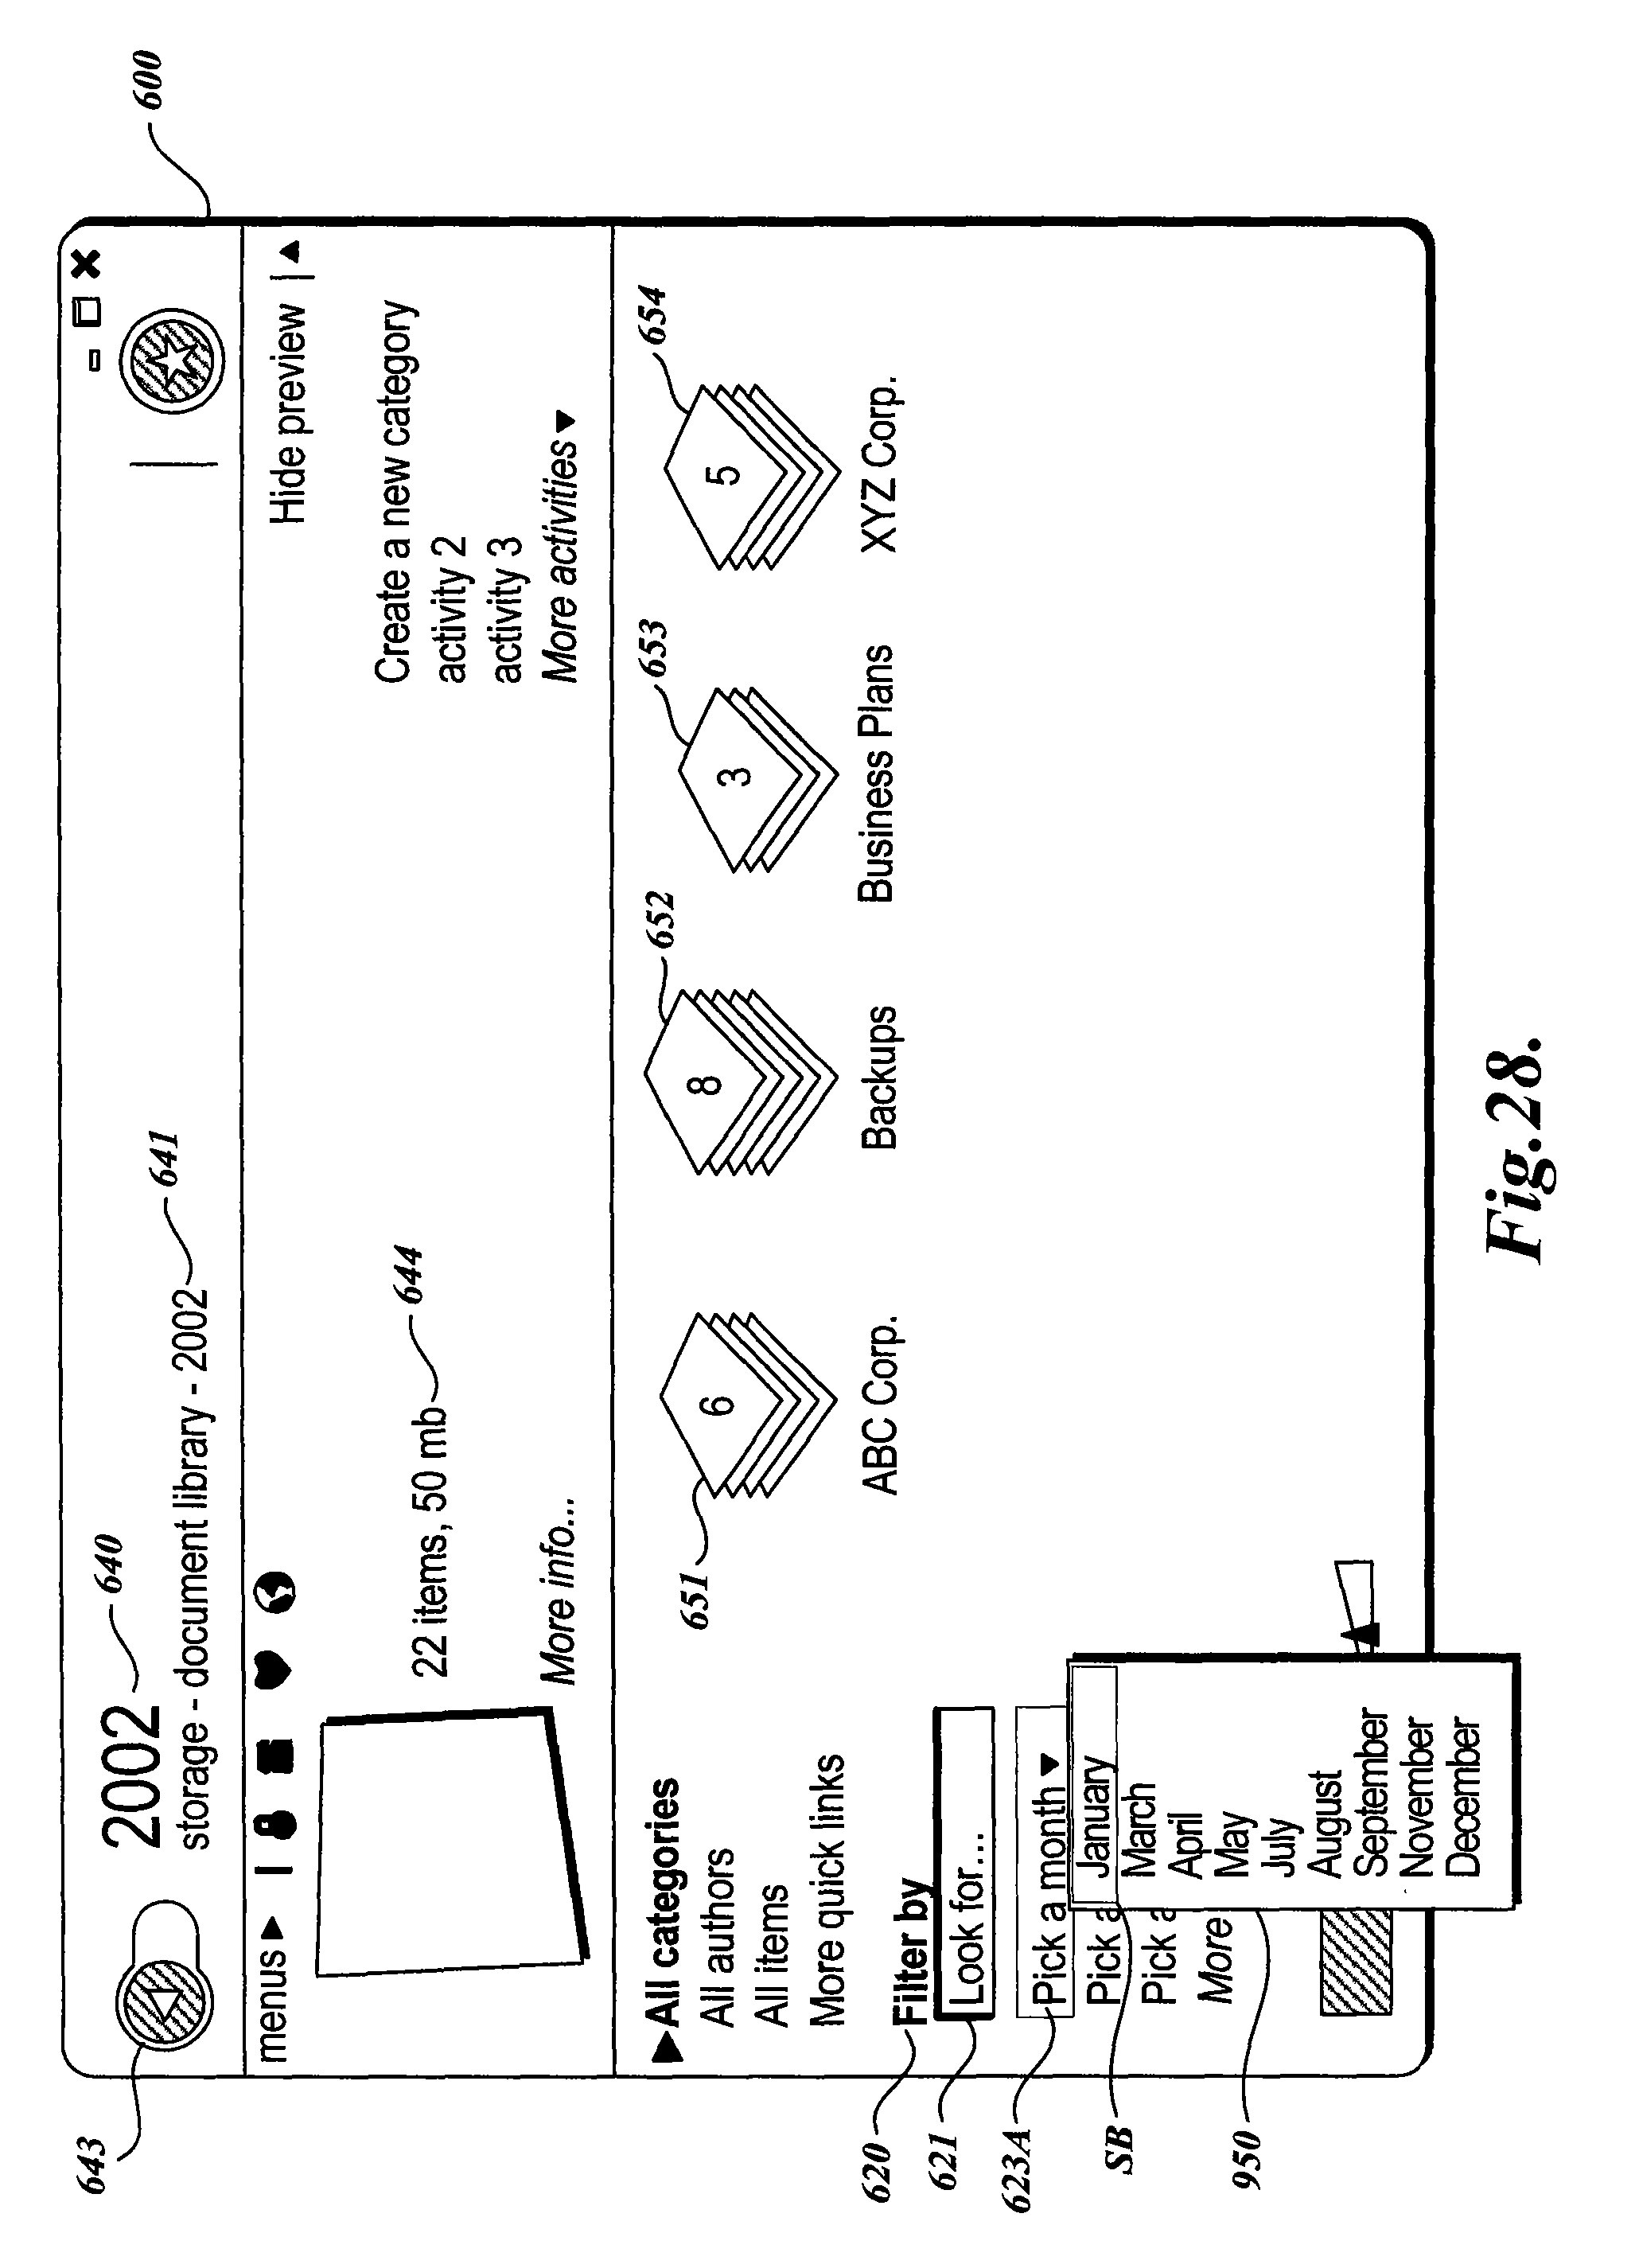 Patent US 9,361,313 B2